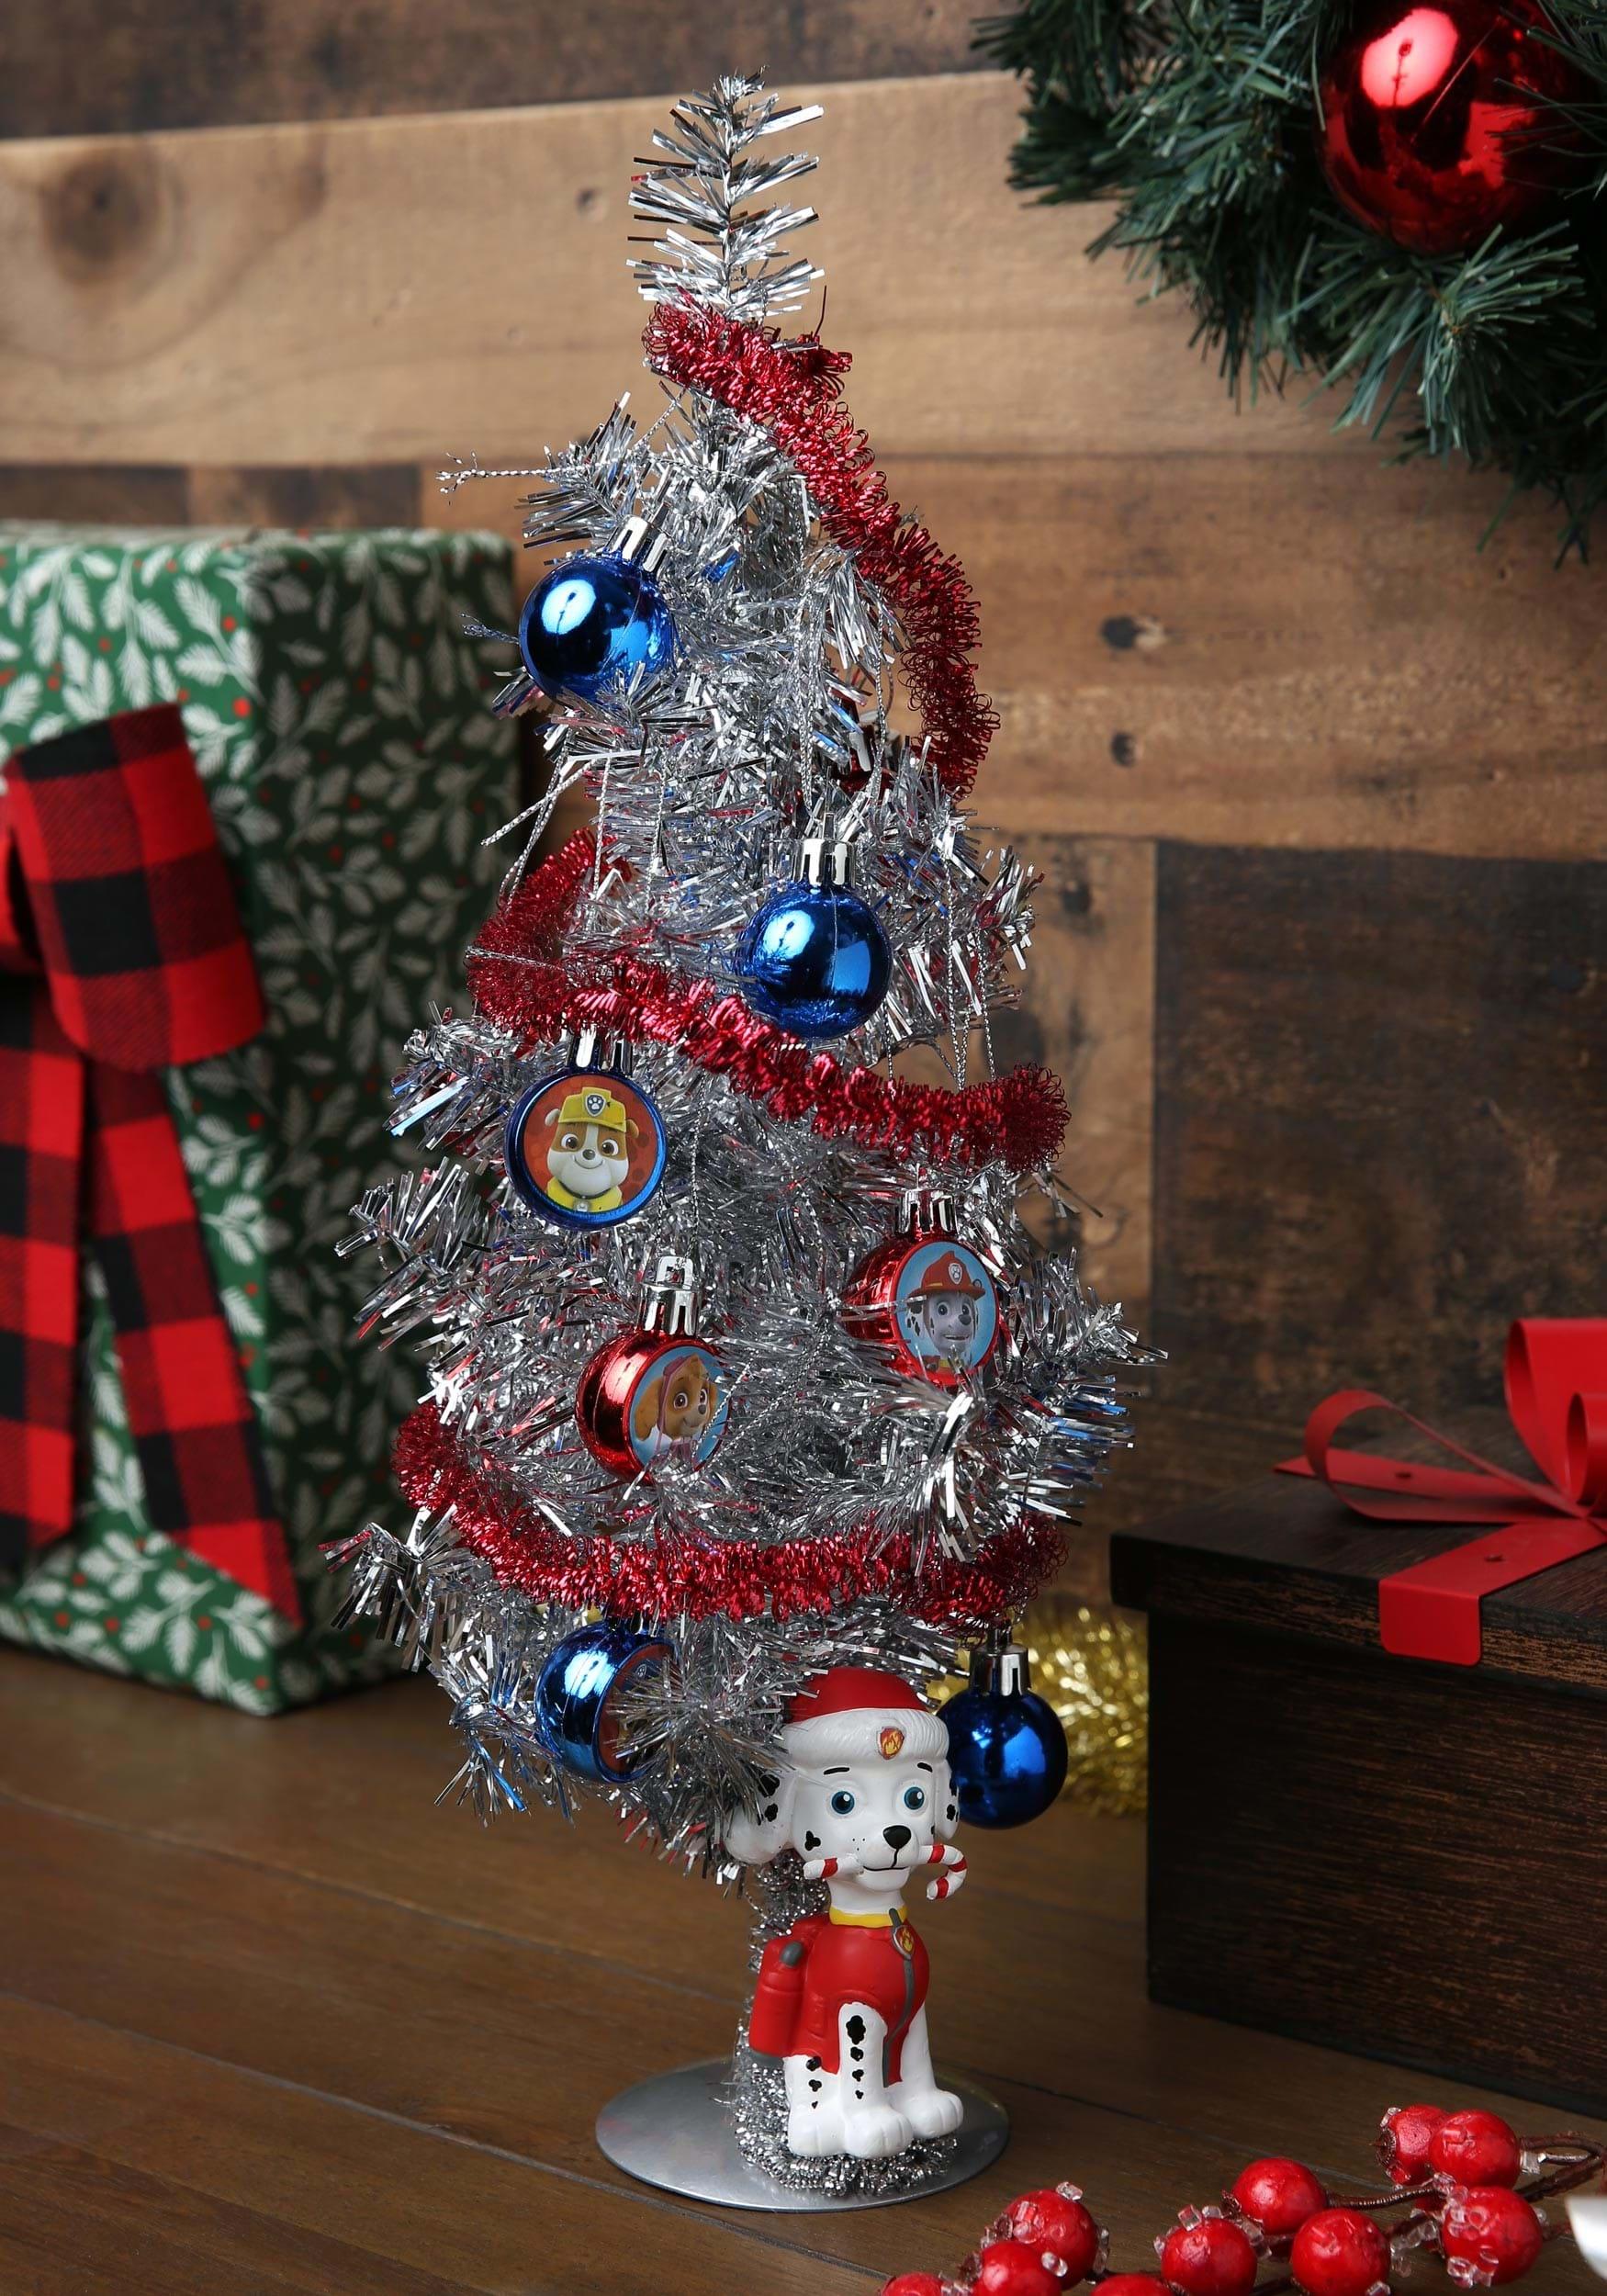 3 Holiday Christmas Ornaments Kurt S Adler Paw Patrol Chase Marshall Skye